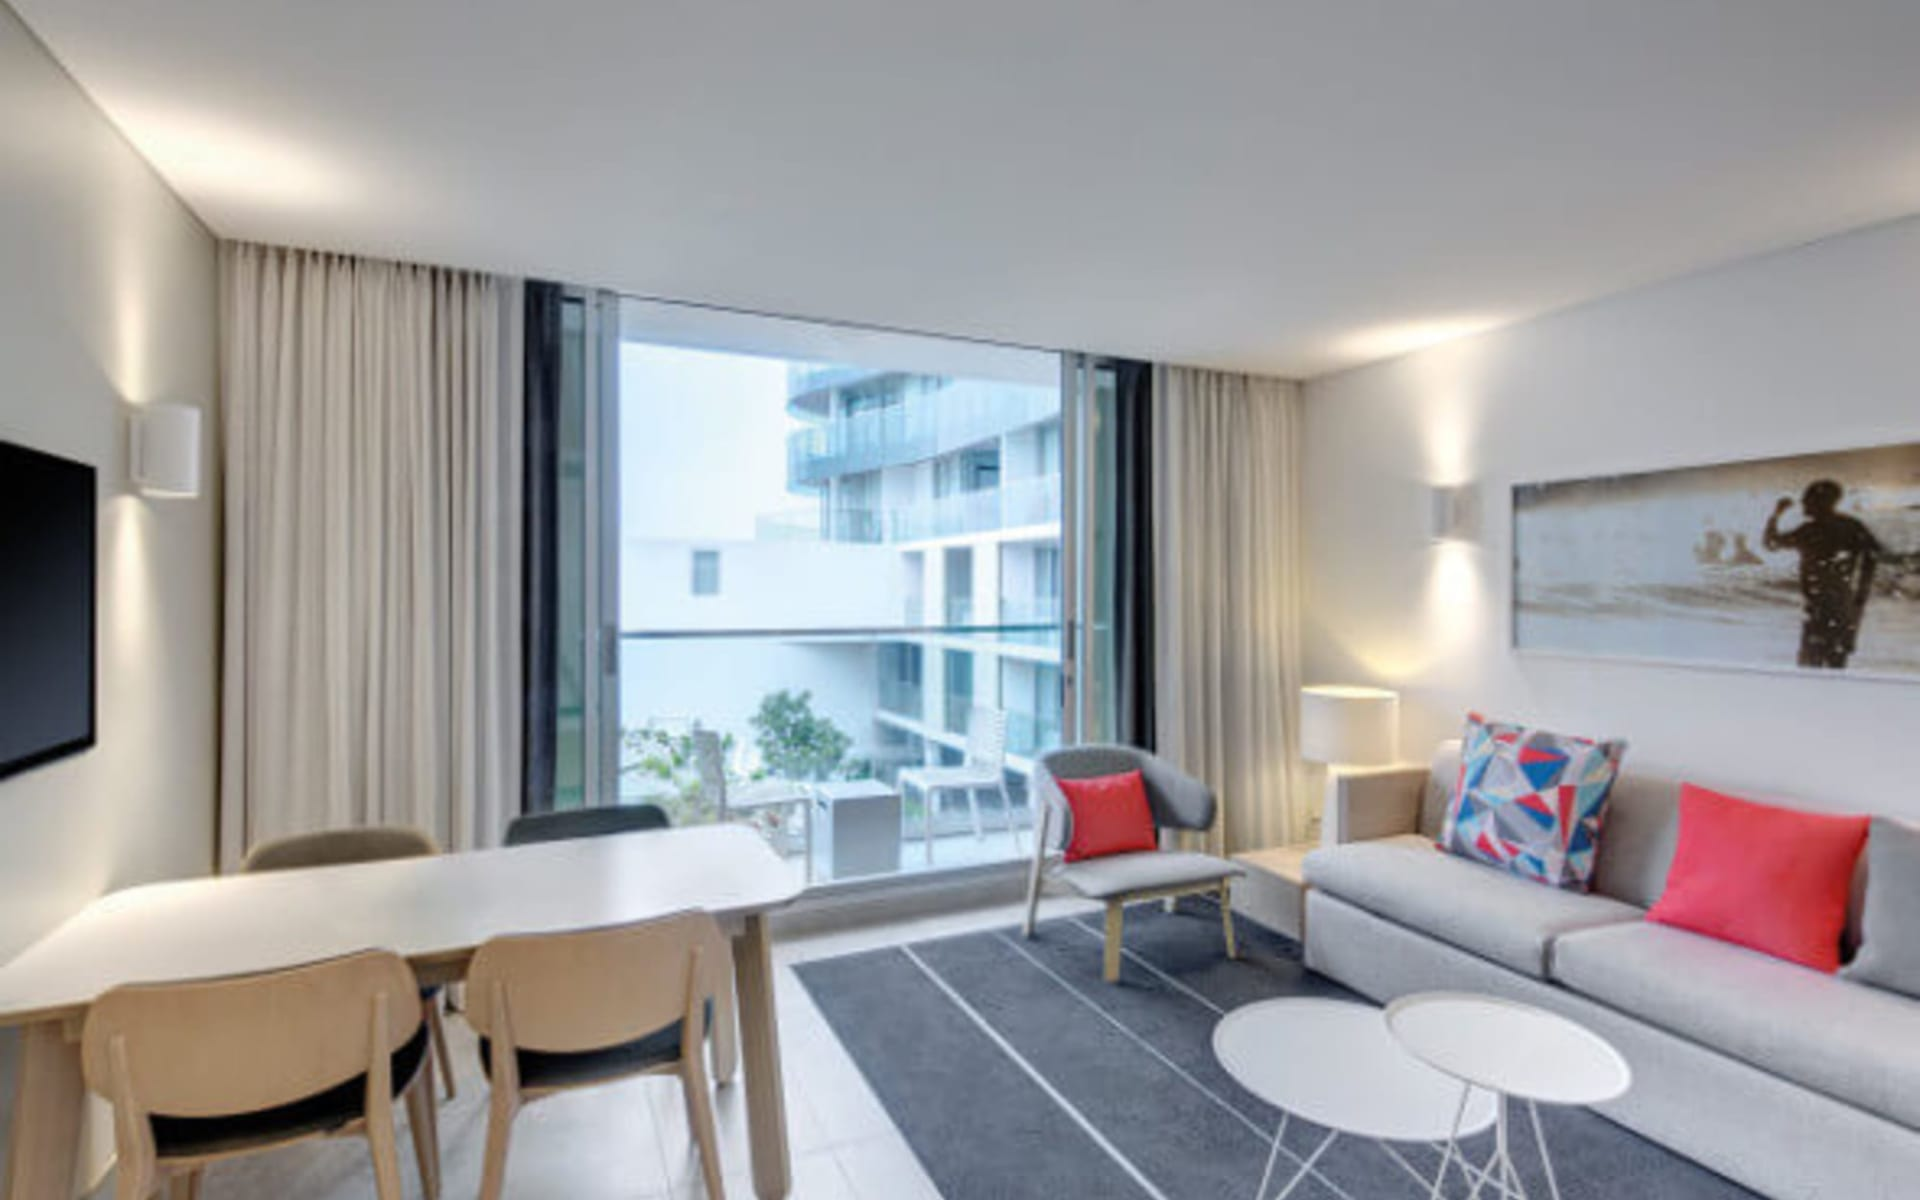 Adina Apartment Hotel Bondi Beach in Sydney - Bondi Beach: Adina-apartment-hotel-bondi-beach-one-bedroom-apartment-lounge-2016-square